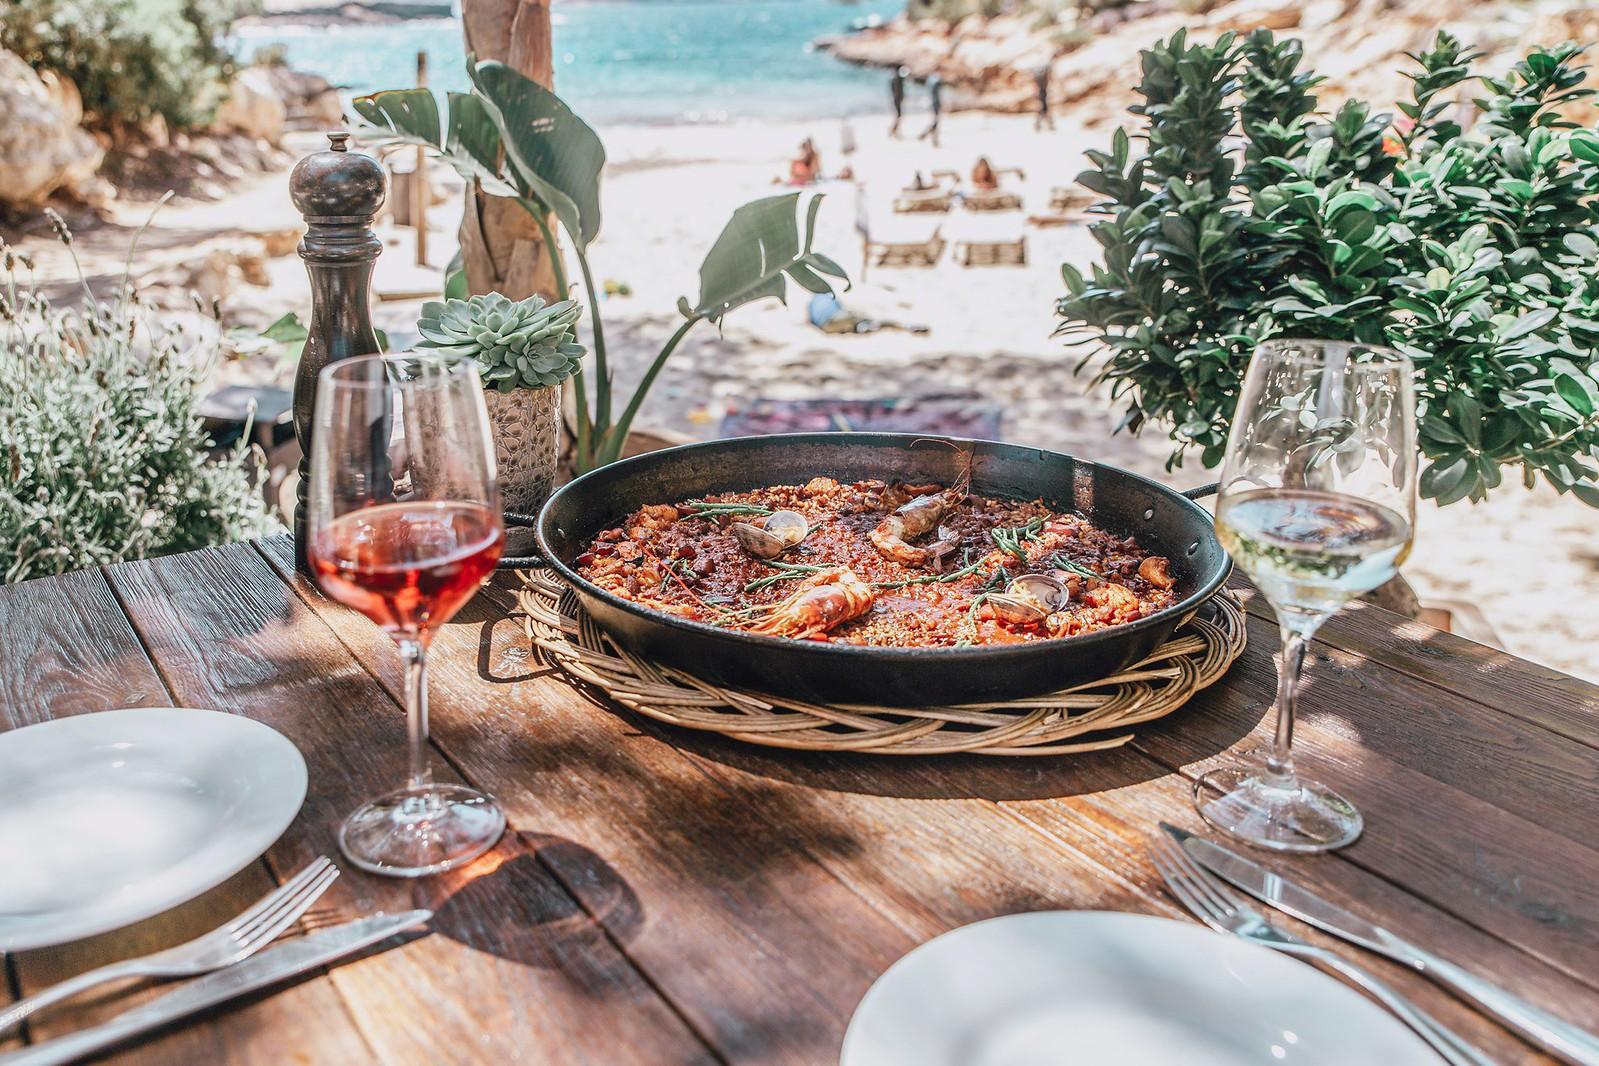 https://www.white-ibiza.com/wp-content/uploads/2020/09/white-ibiza-beach-restaurants-cala-gracioneta-chiringuito-09.jpg